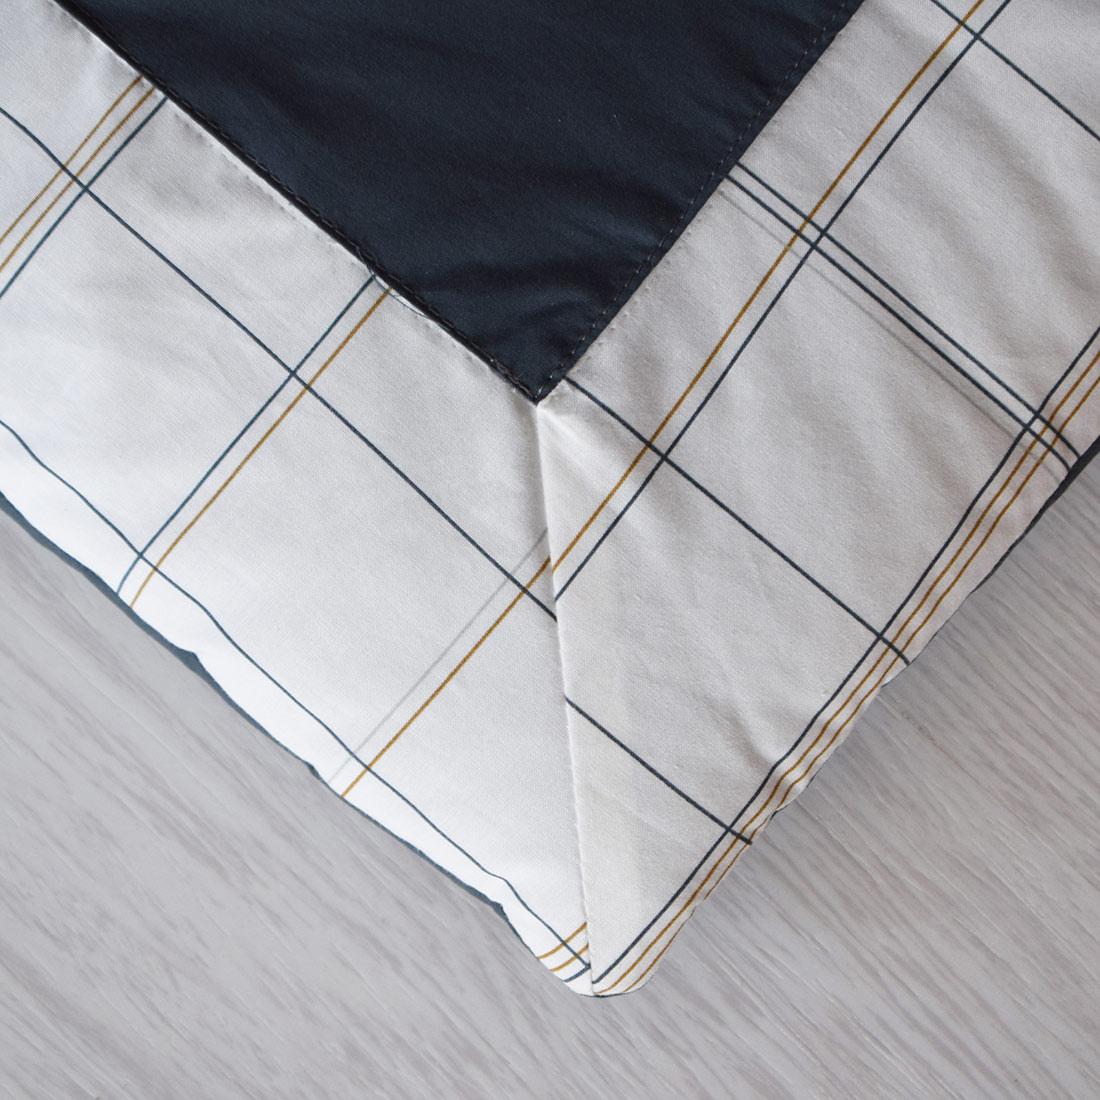 tapis d eveil rectangulaire saint honore